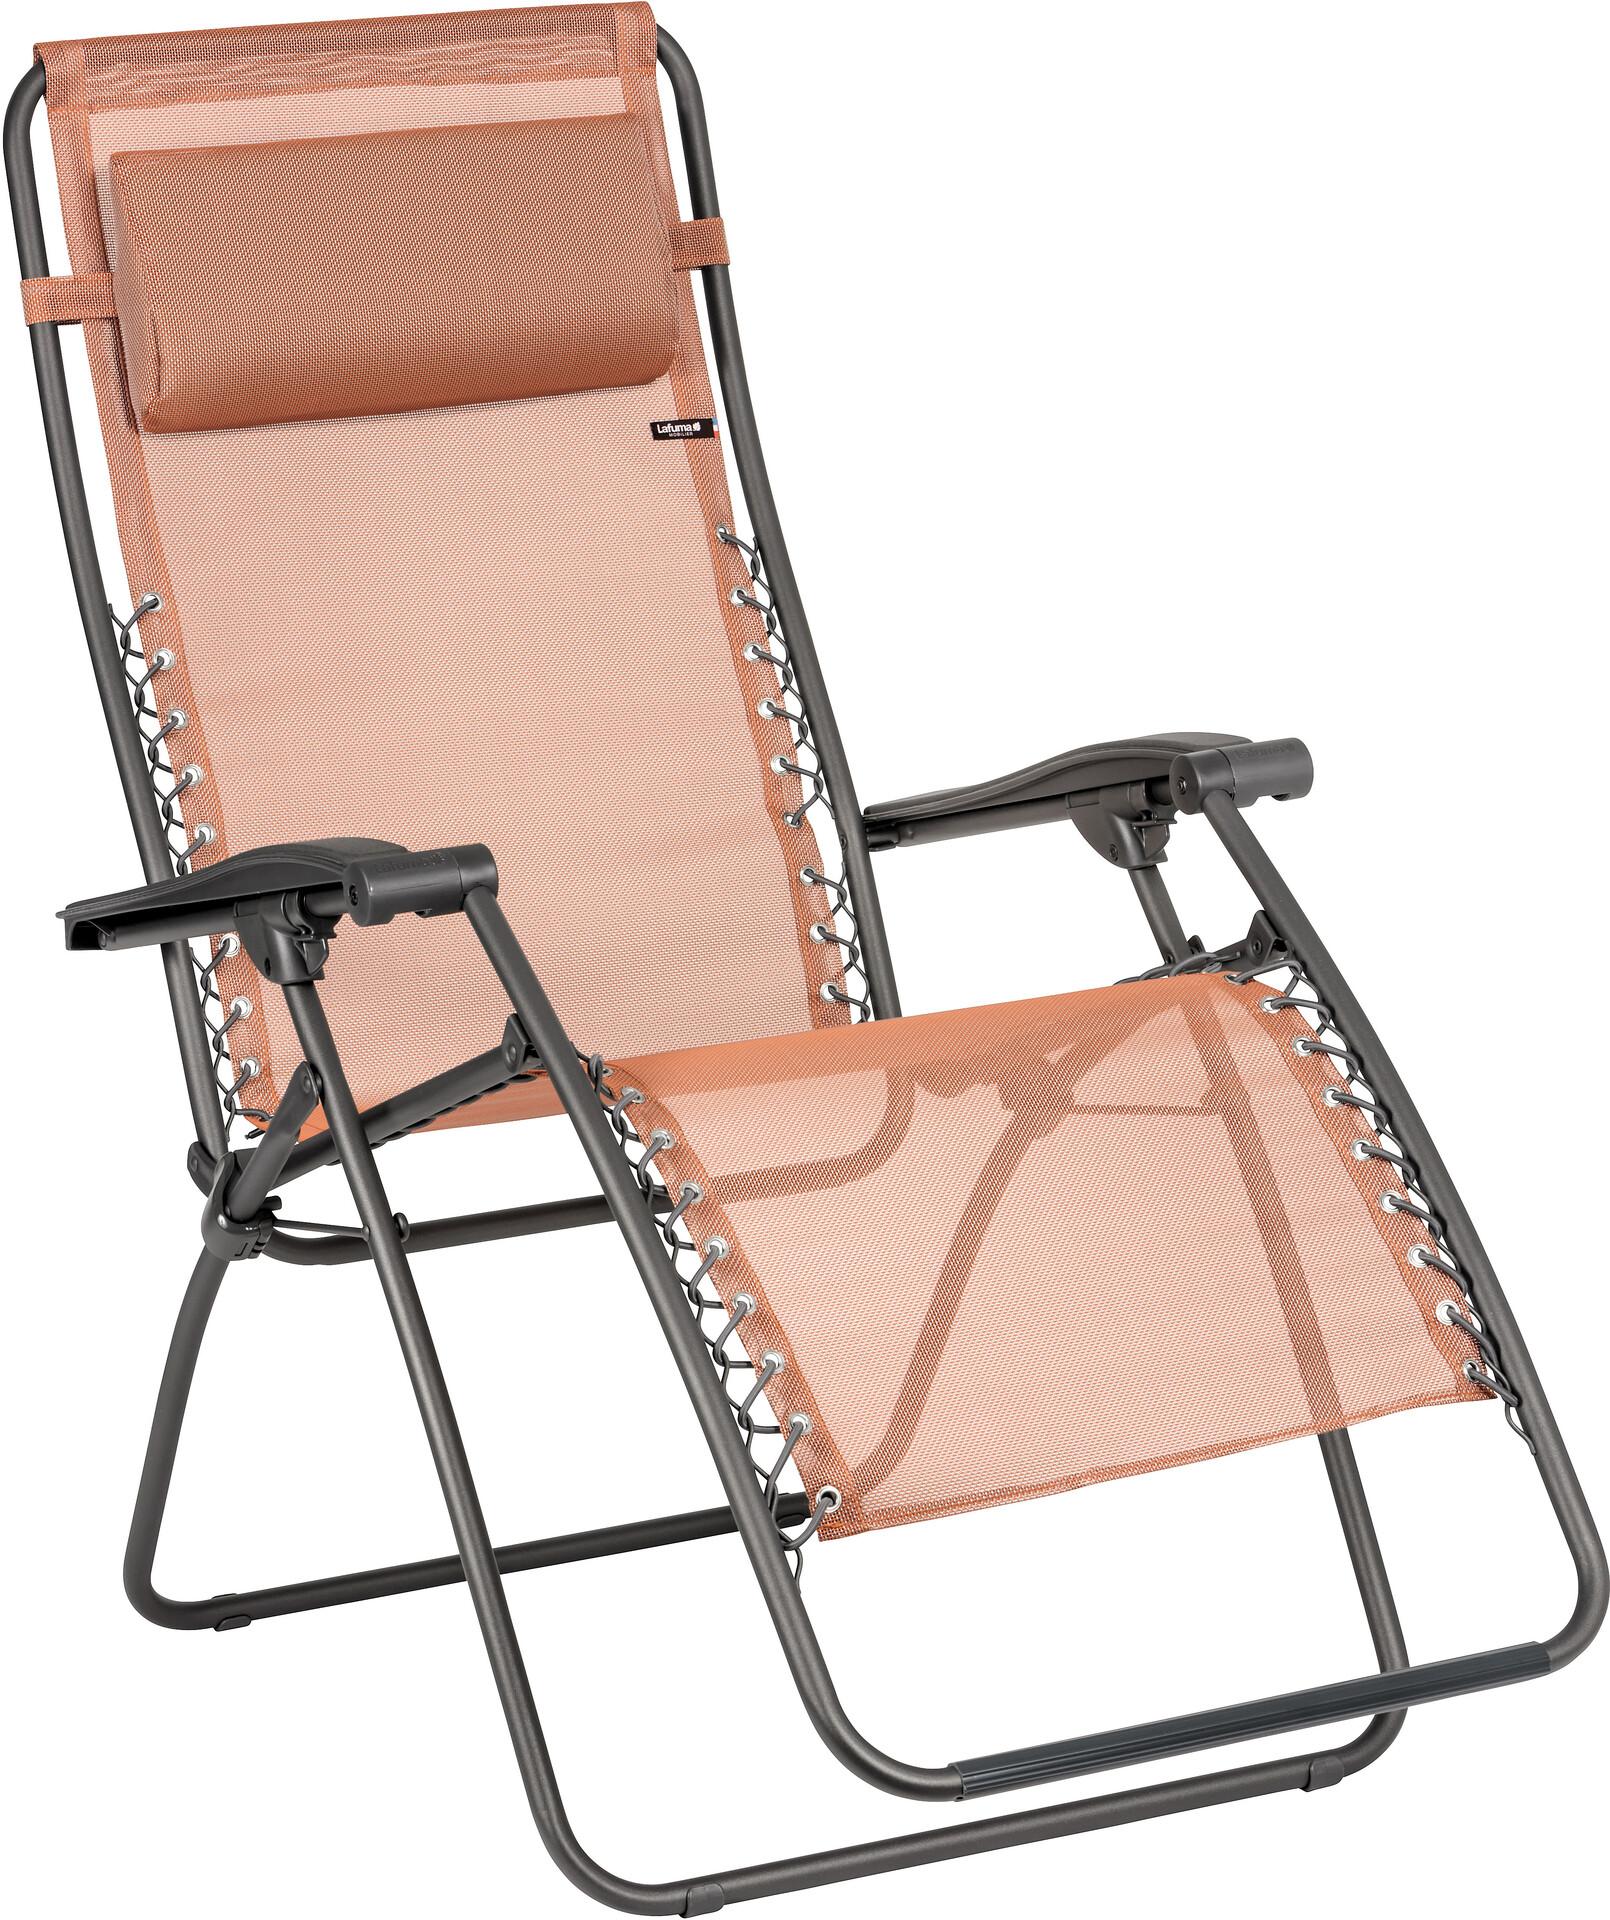 Lafuma Mobilier RSXA Chaise longue avec Cannage Phifertex, terracotta